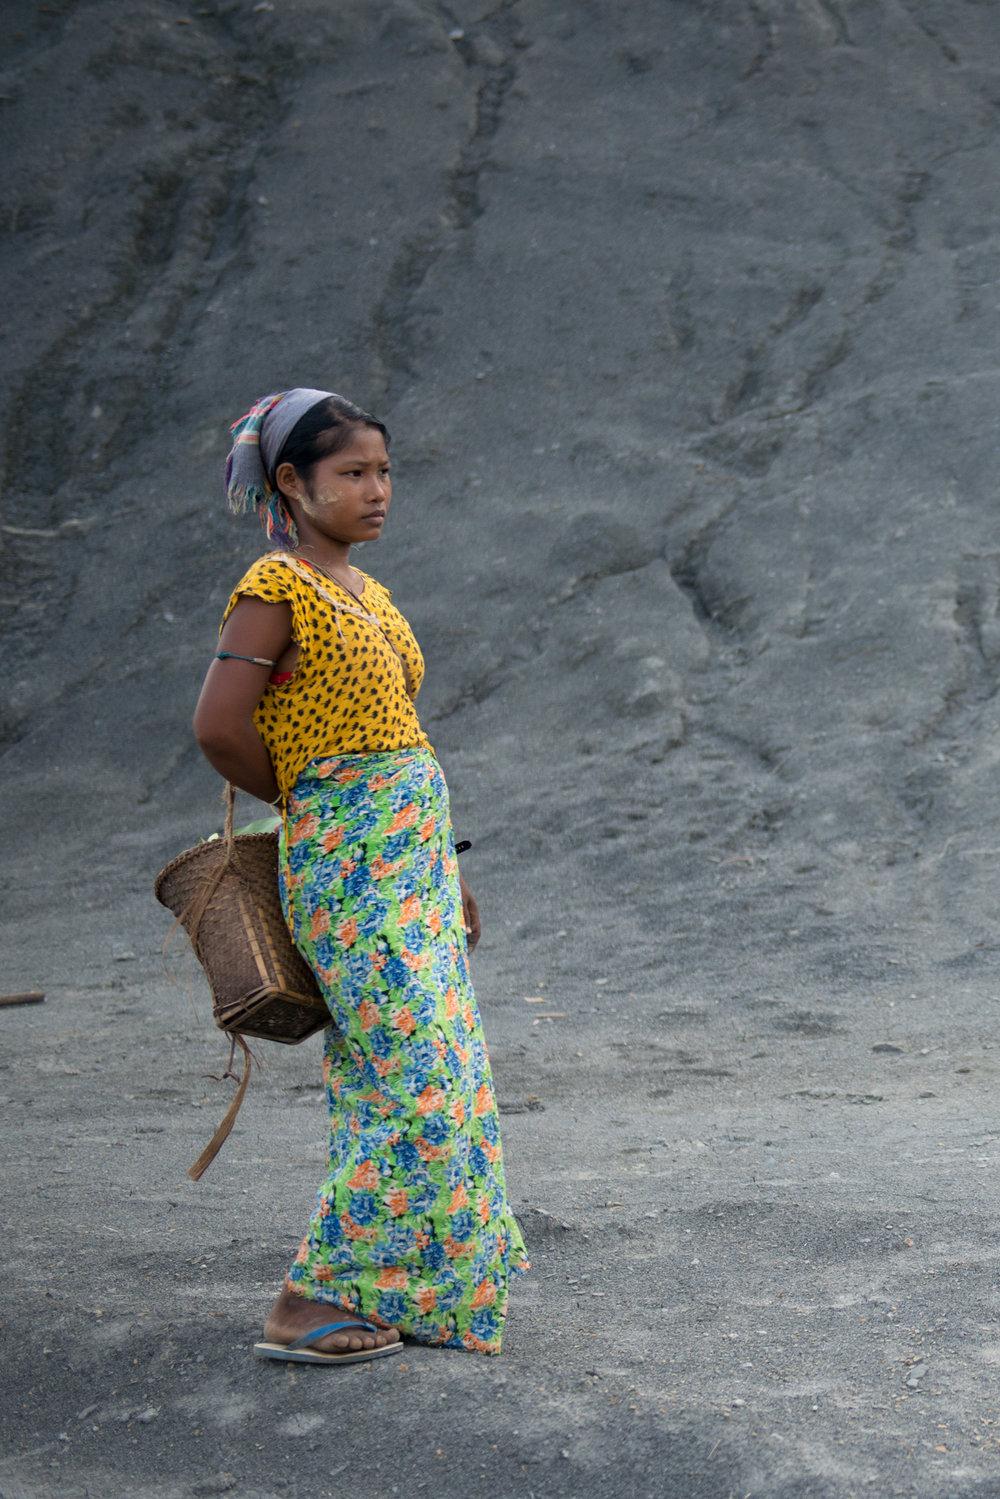 15_Chhandak Pradhan-Reportage-The_Promise_of_Asphalt-Border_road_NE India_Burma_Le Monde.jpg